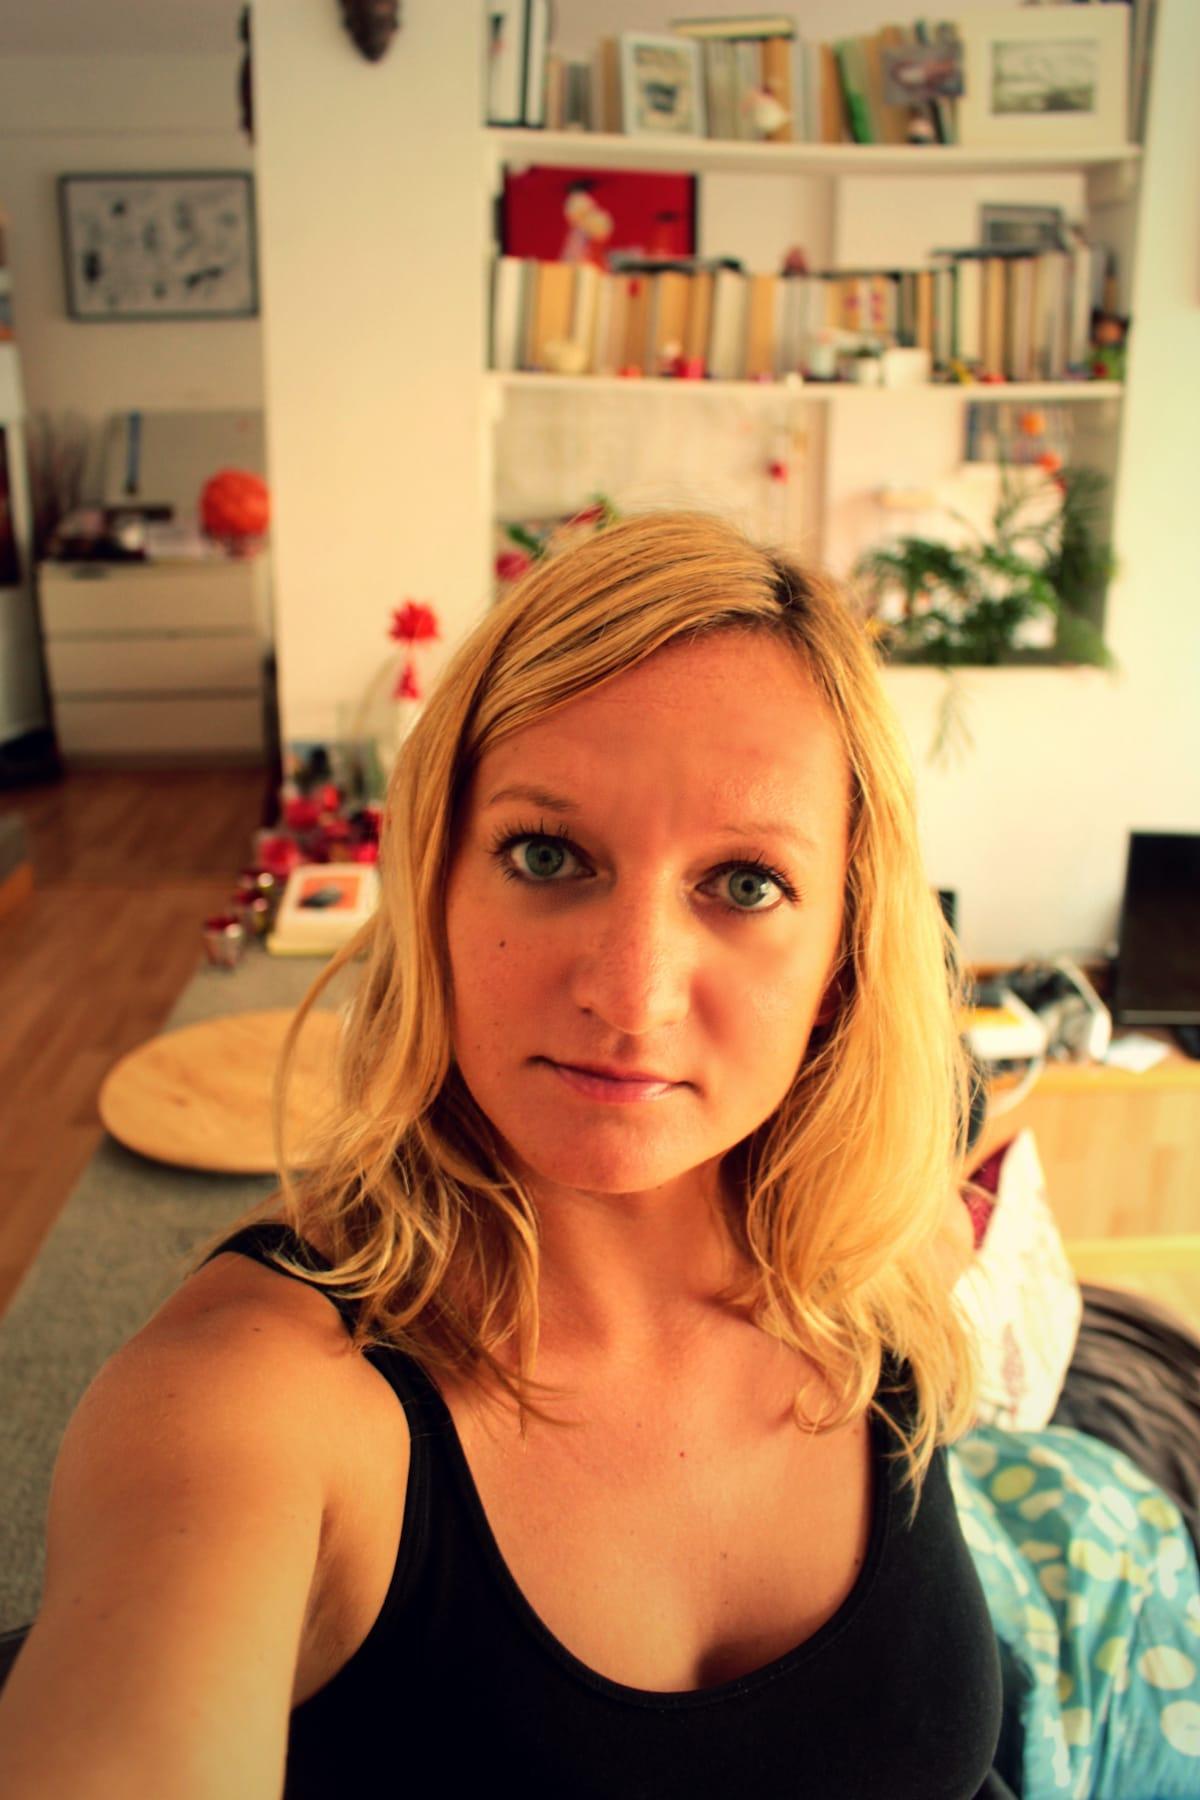 Milena from Barcelona